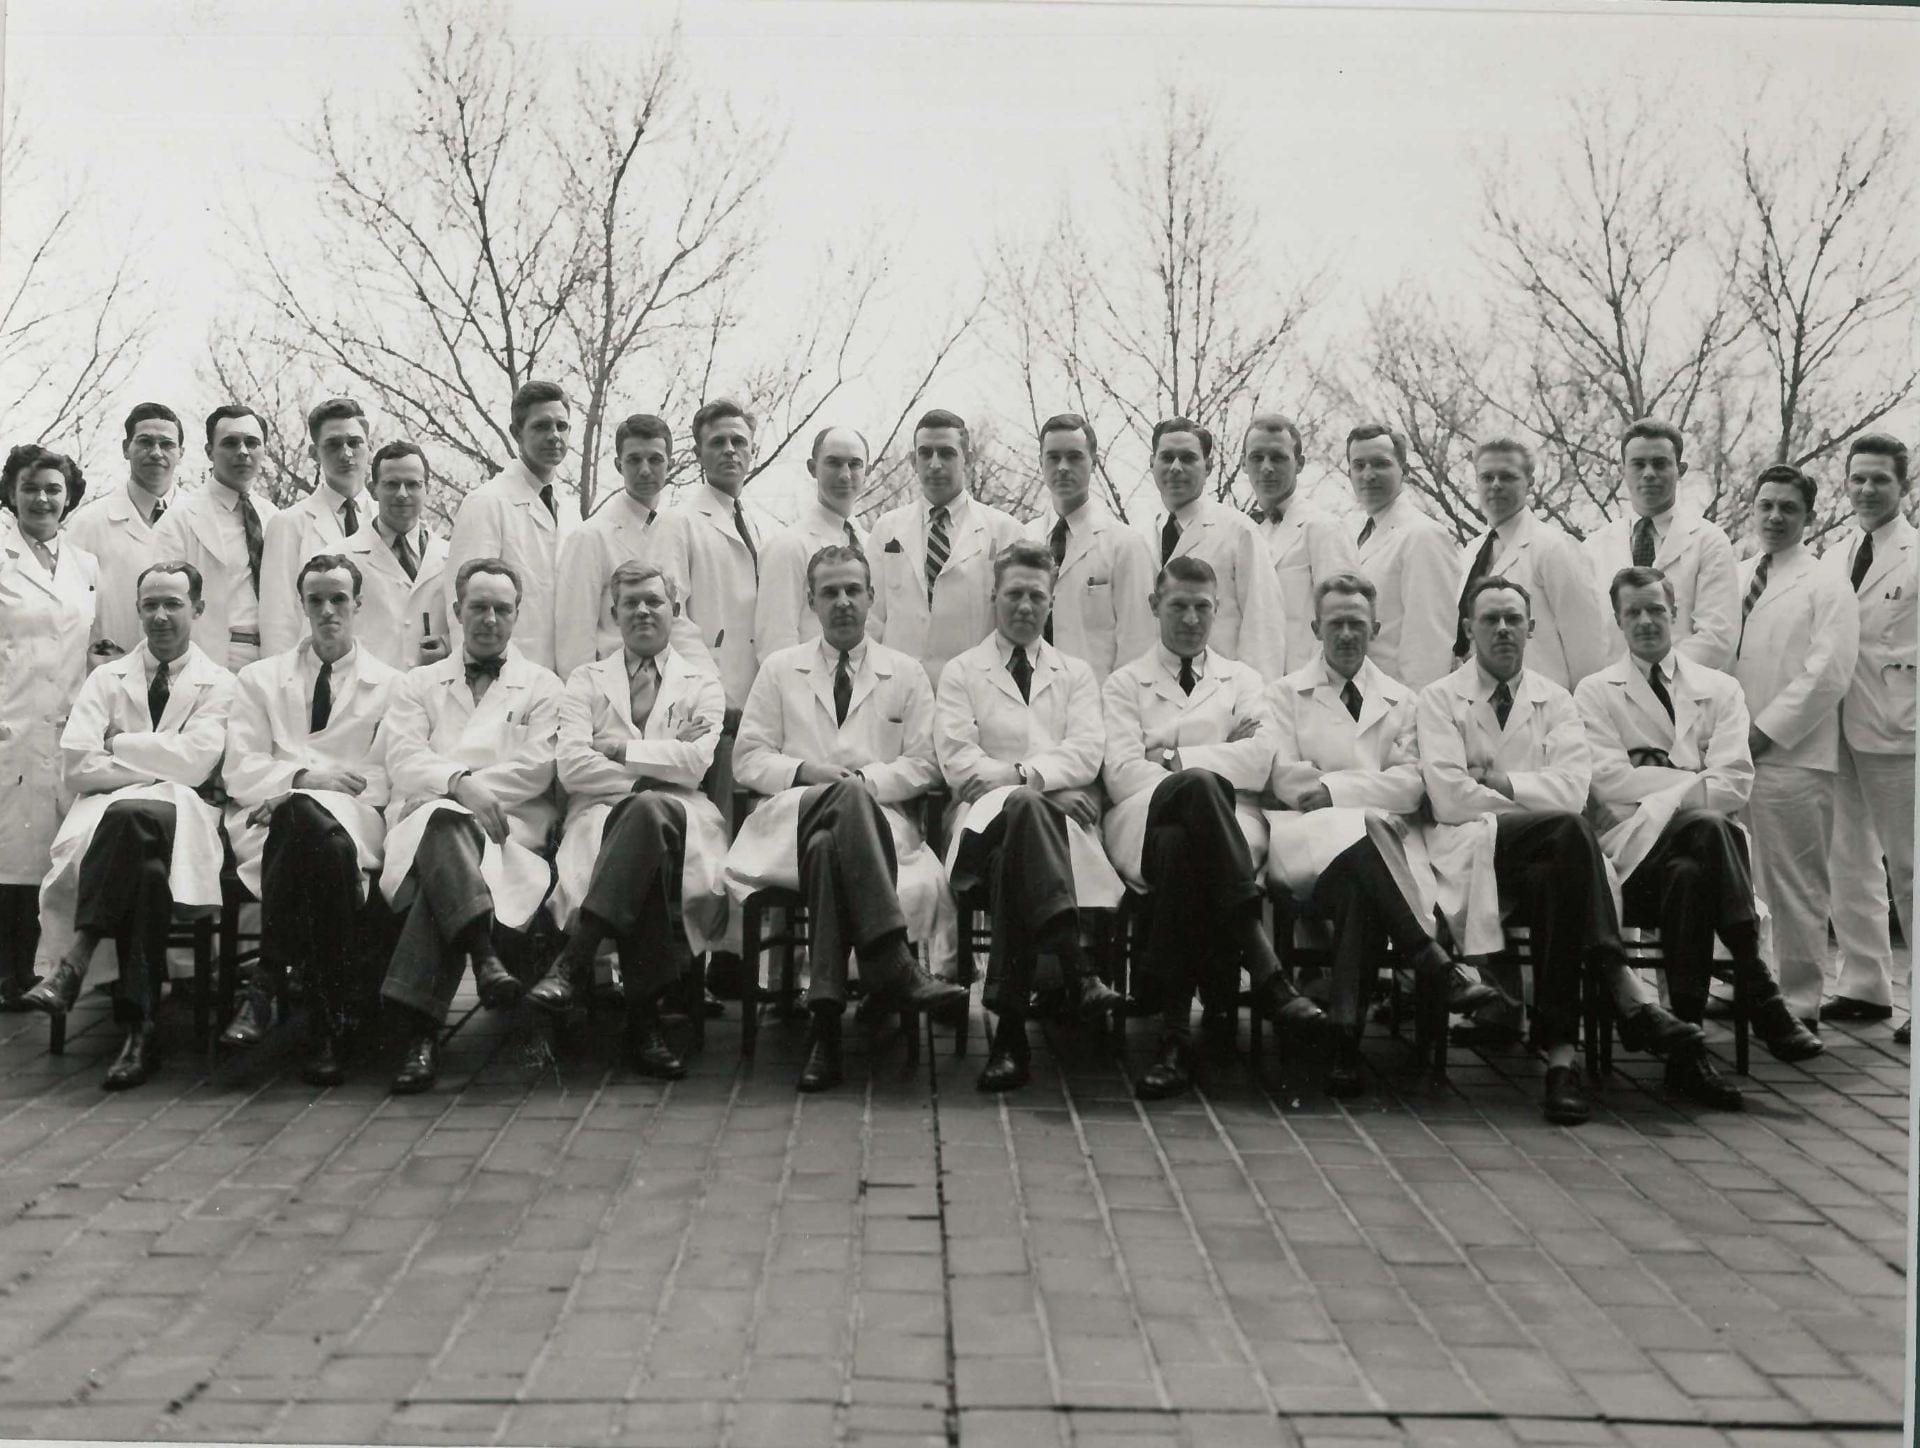 1946 Housestaff Photo (3)